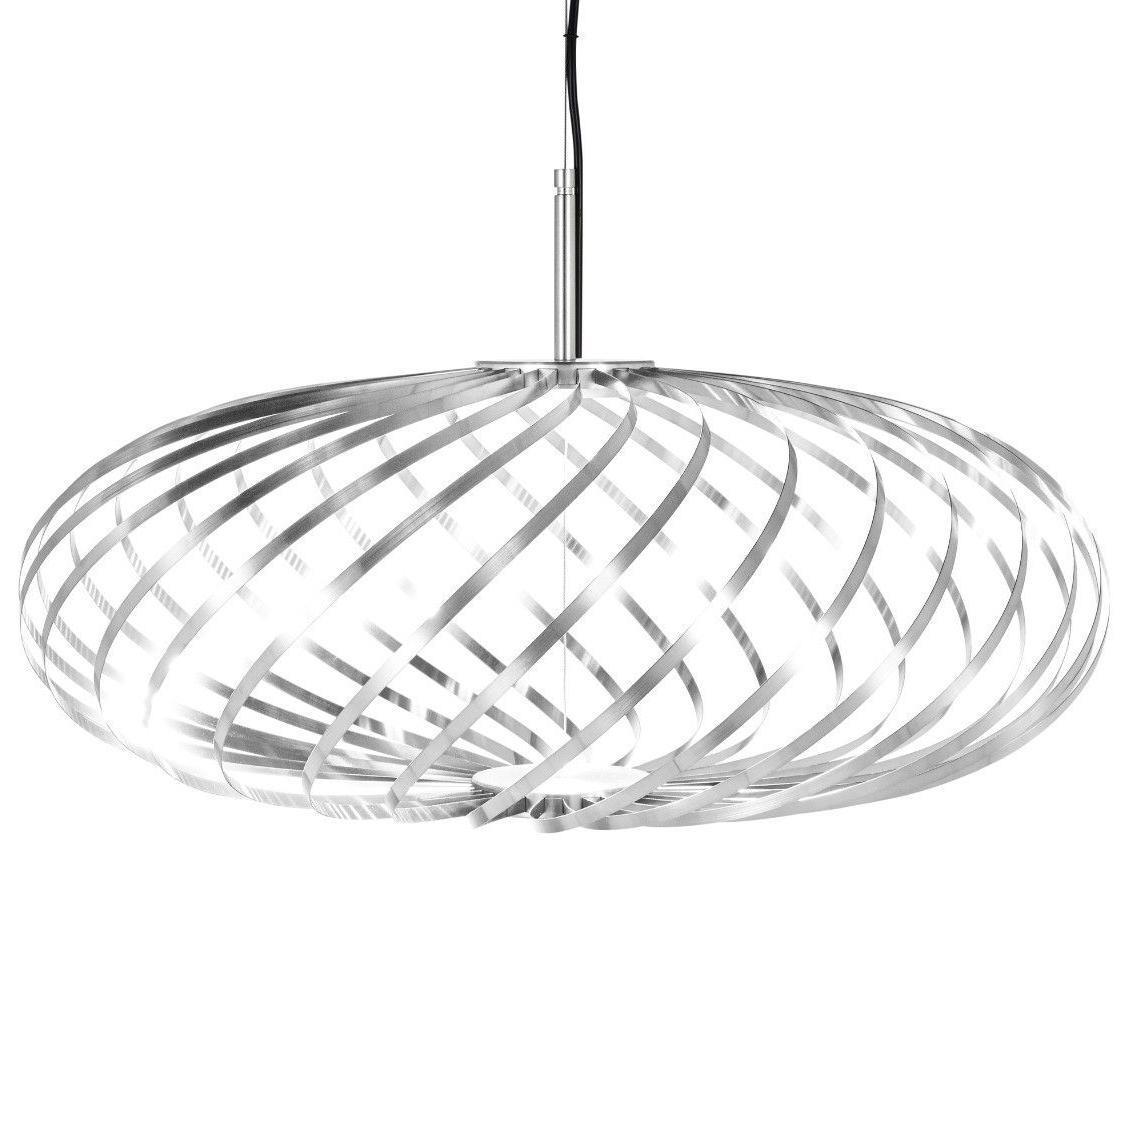 FonQ-Tom Dixon Spring small hanglamp LED zilver-aanbieding